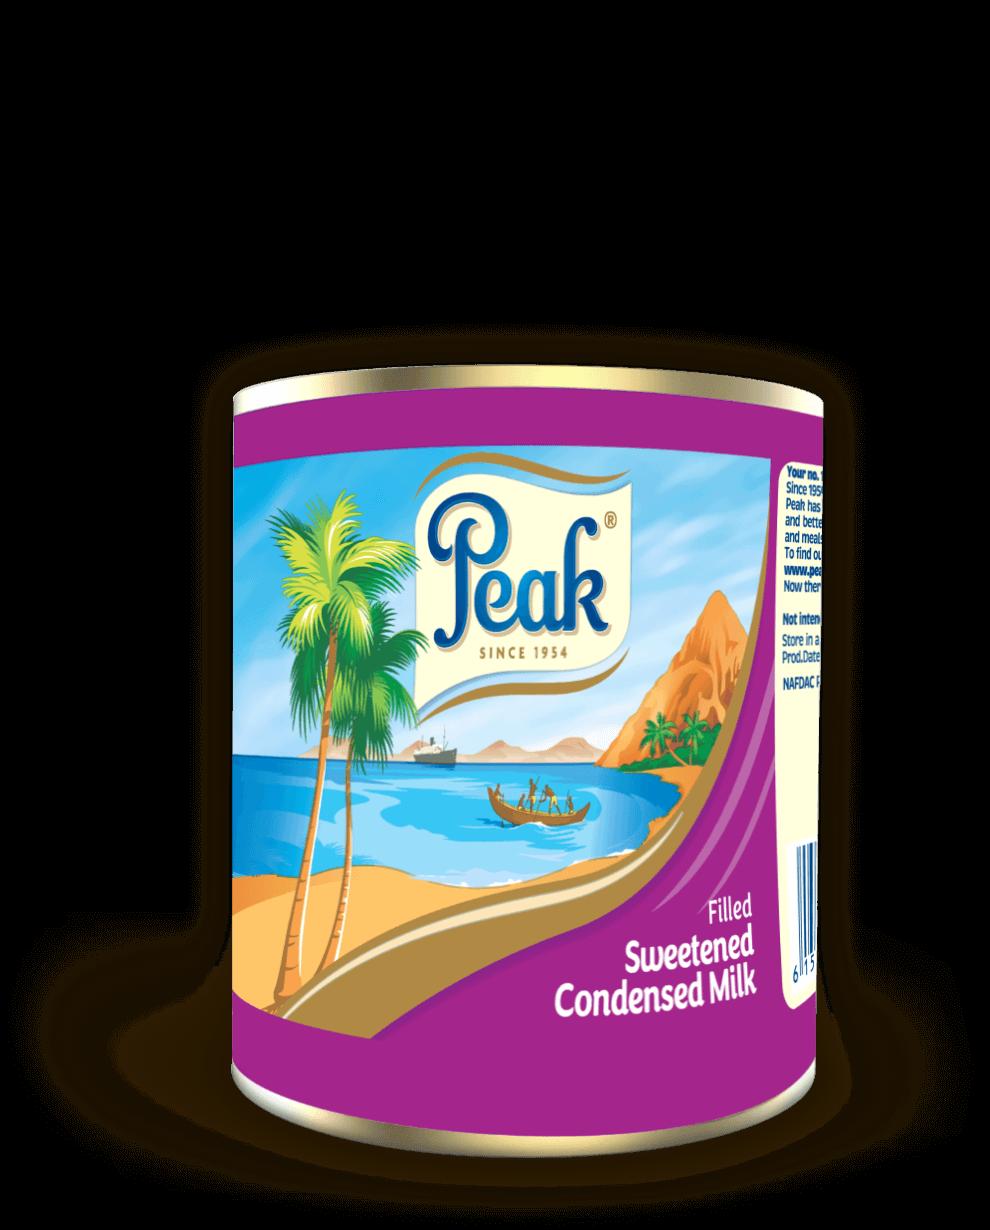 Peak Filled Sweetened Condensed Milk Tin